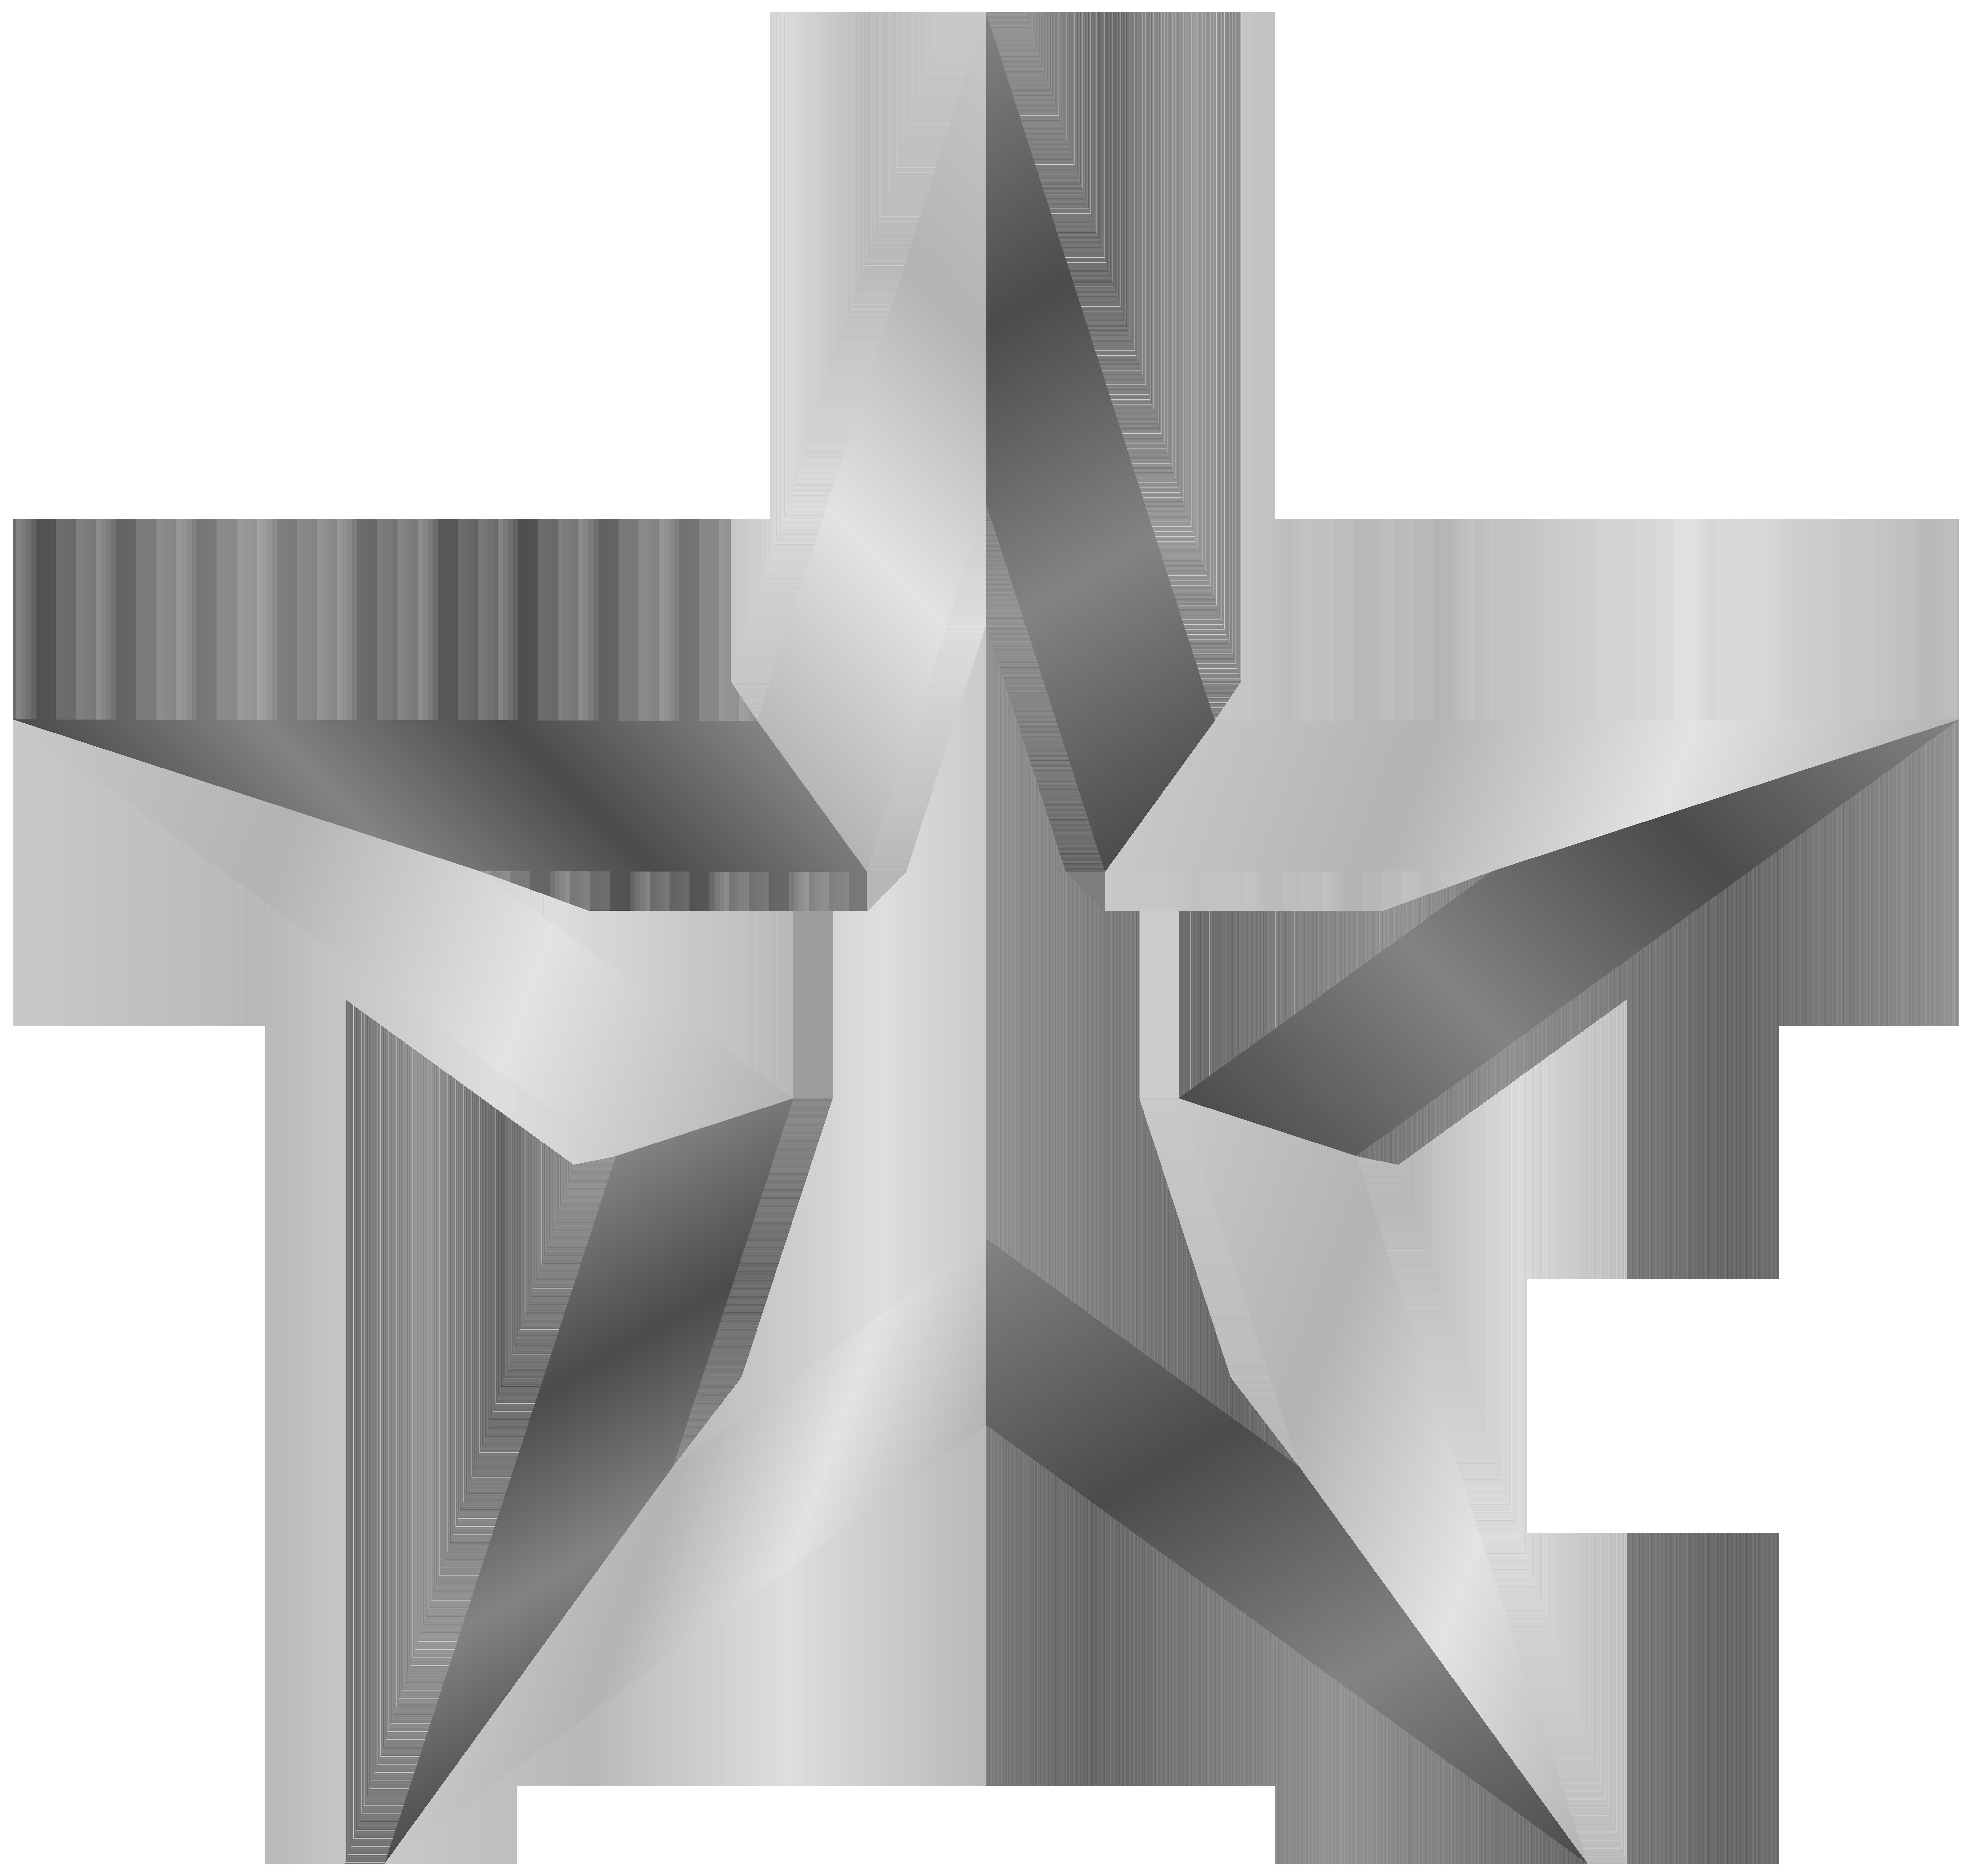 image freeuse Silver Star Transparent PNG Clip Art Image